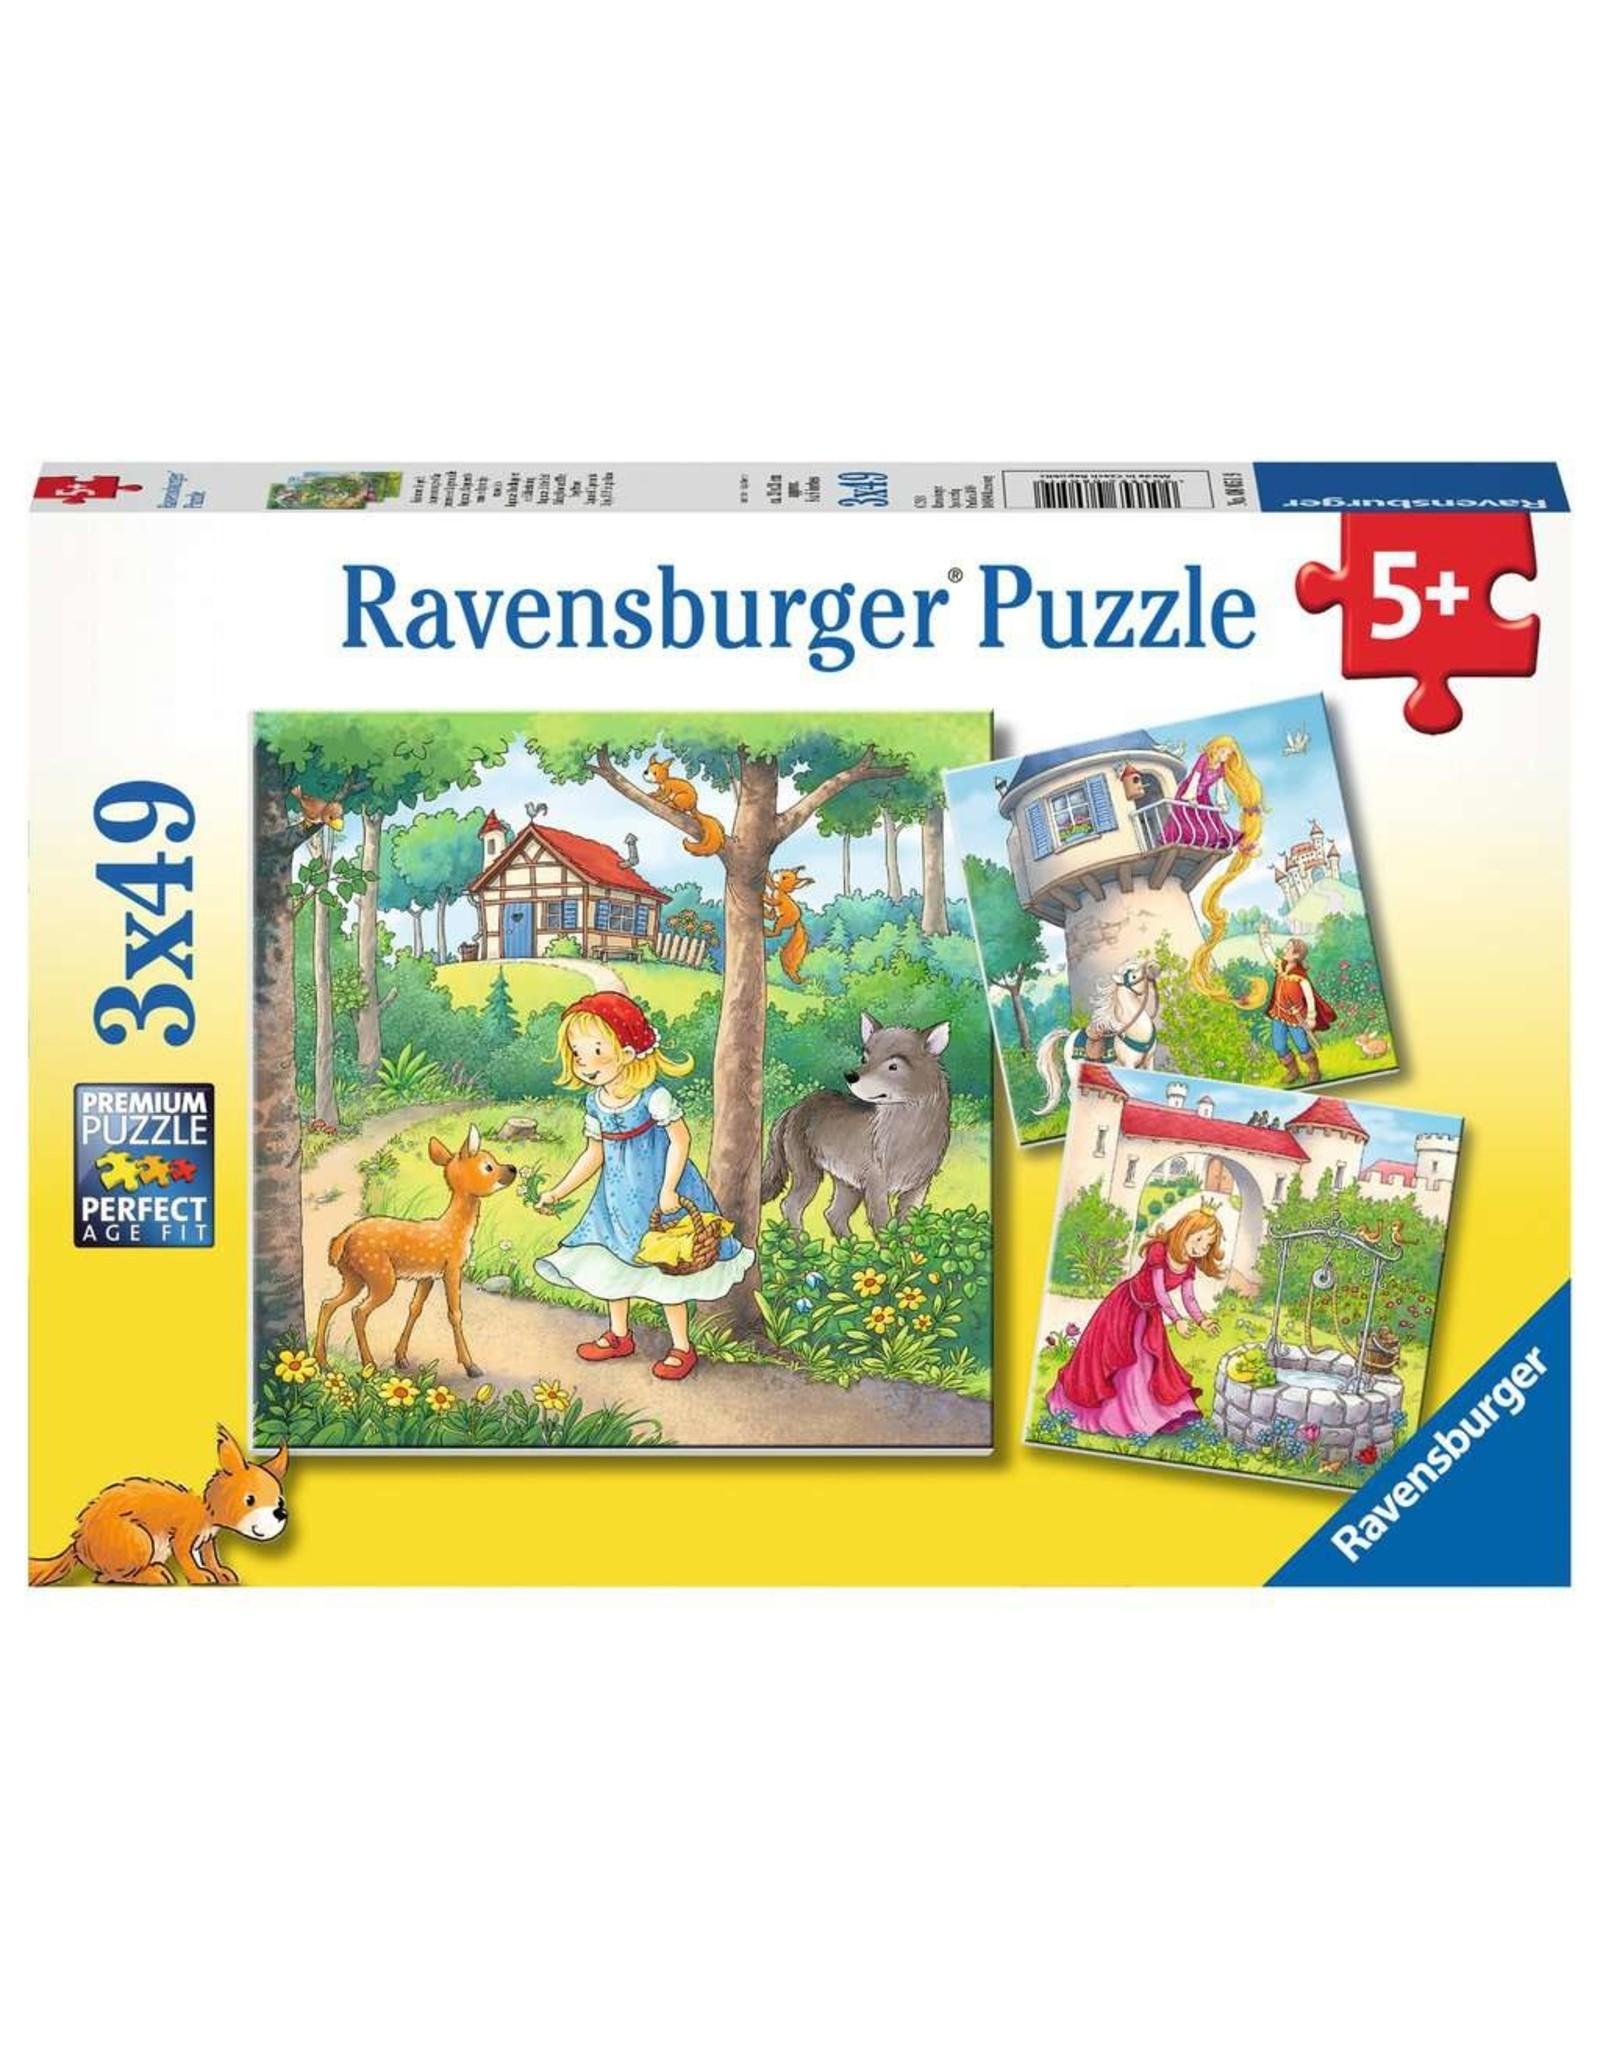 Ravensburger Rapunzel, Red Riding Hood & Frog King 3x49pc Puzzles